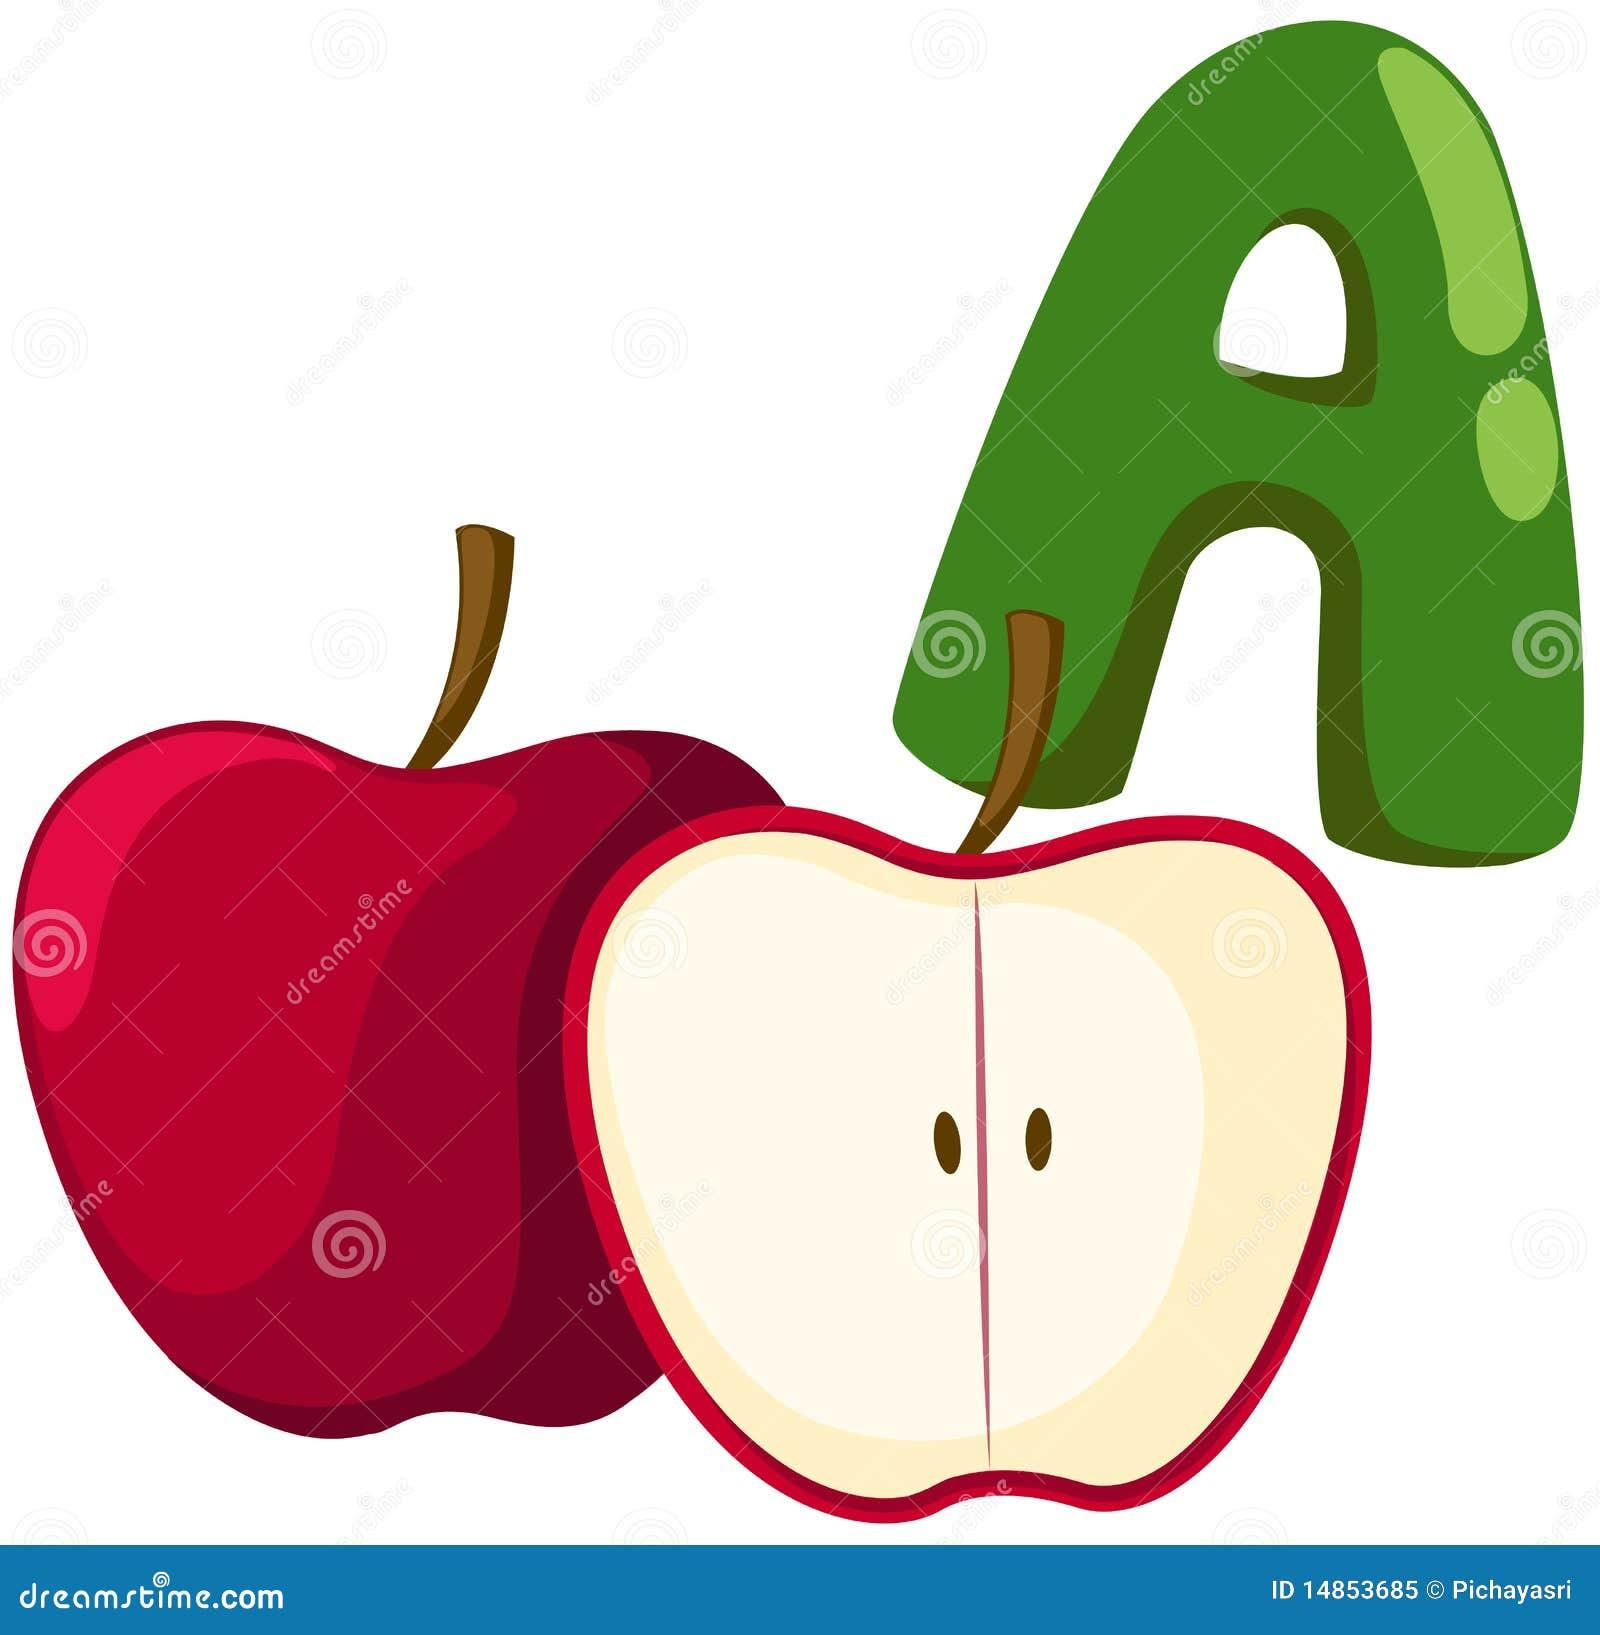 alphabet a for apple stock vector illustration of illustration